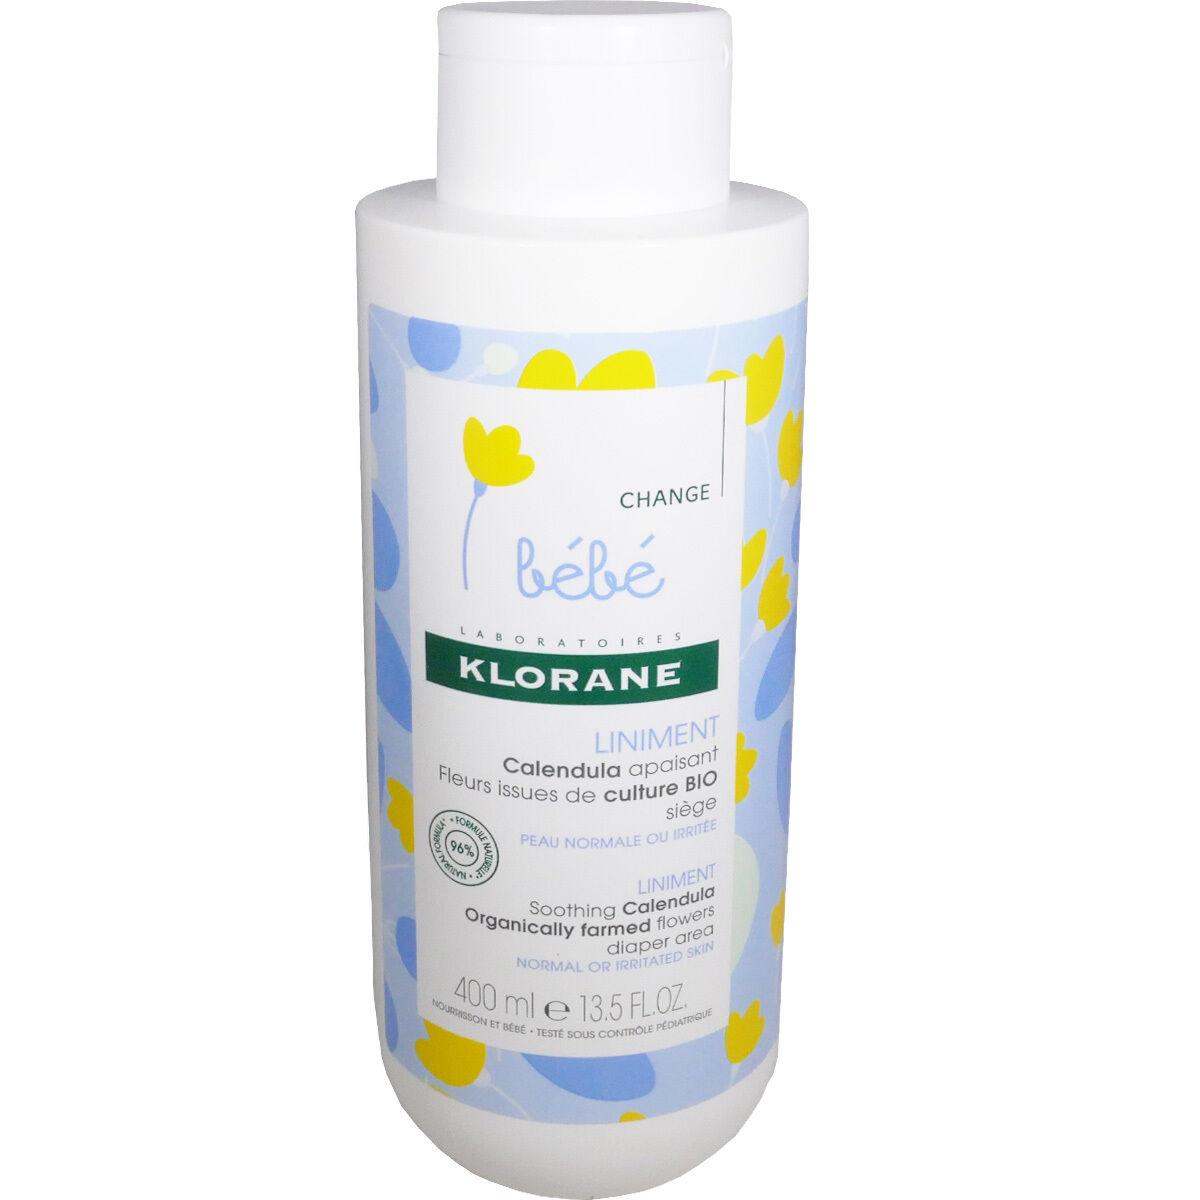 Klorane liniment change 400 ml